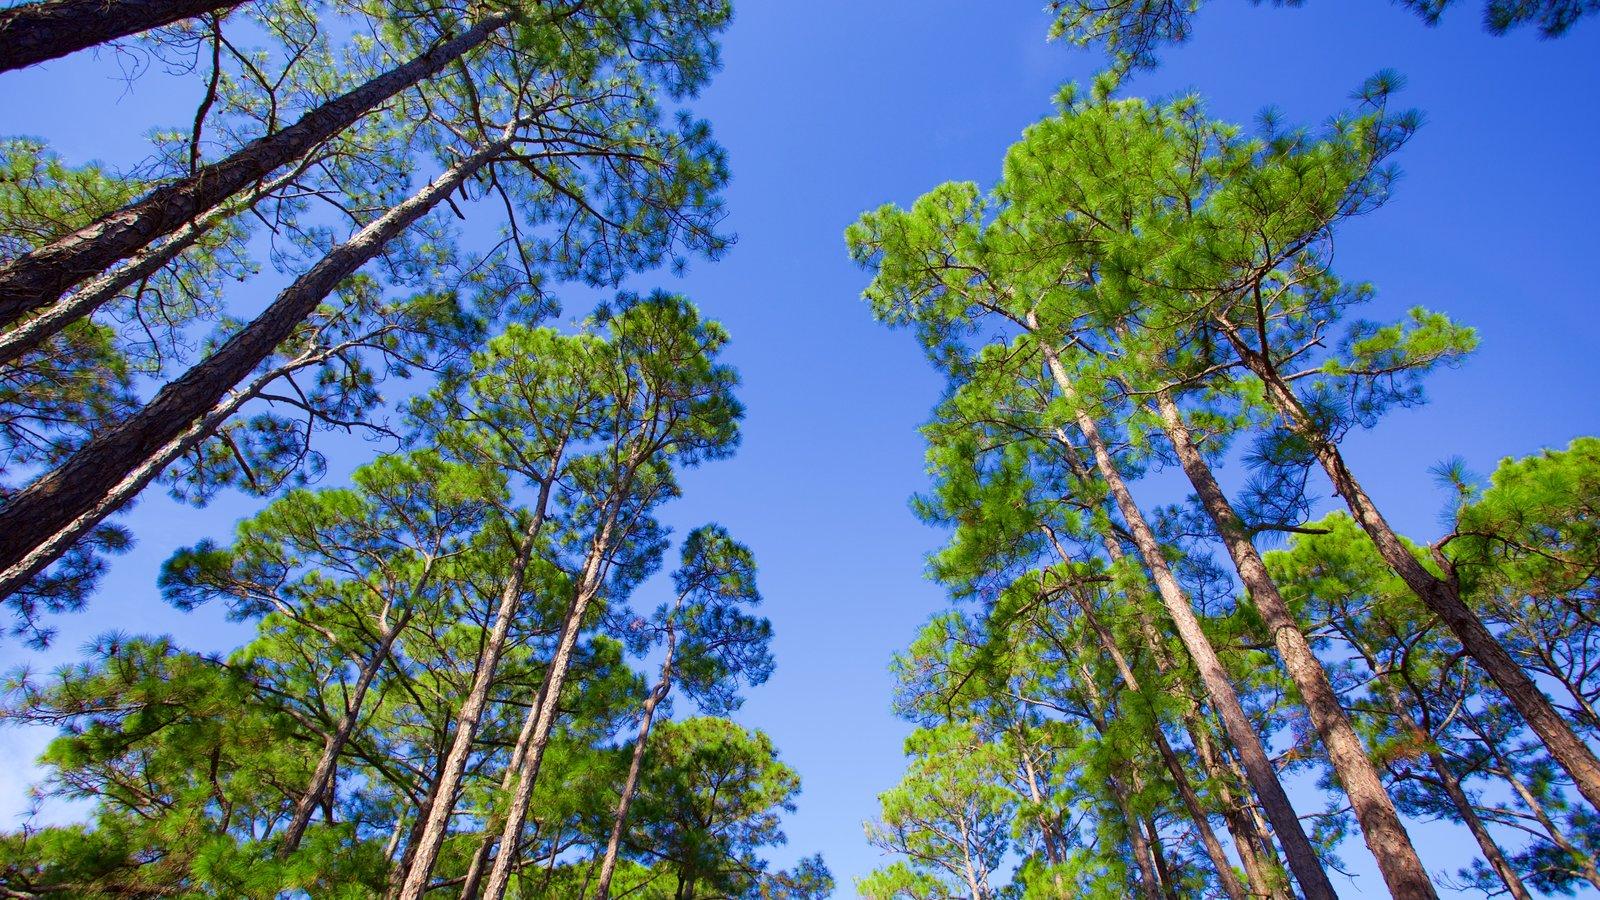 St. Andrews State Park caracterizando cenas de floresta